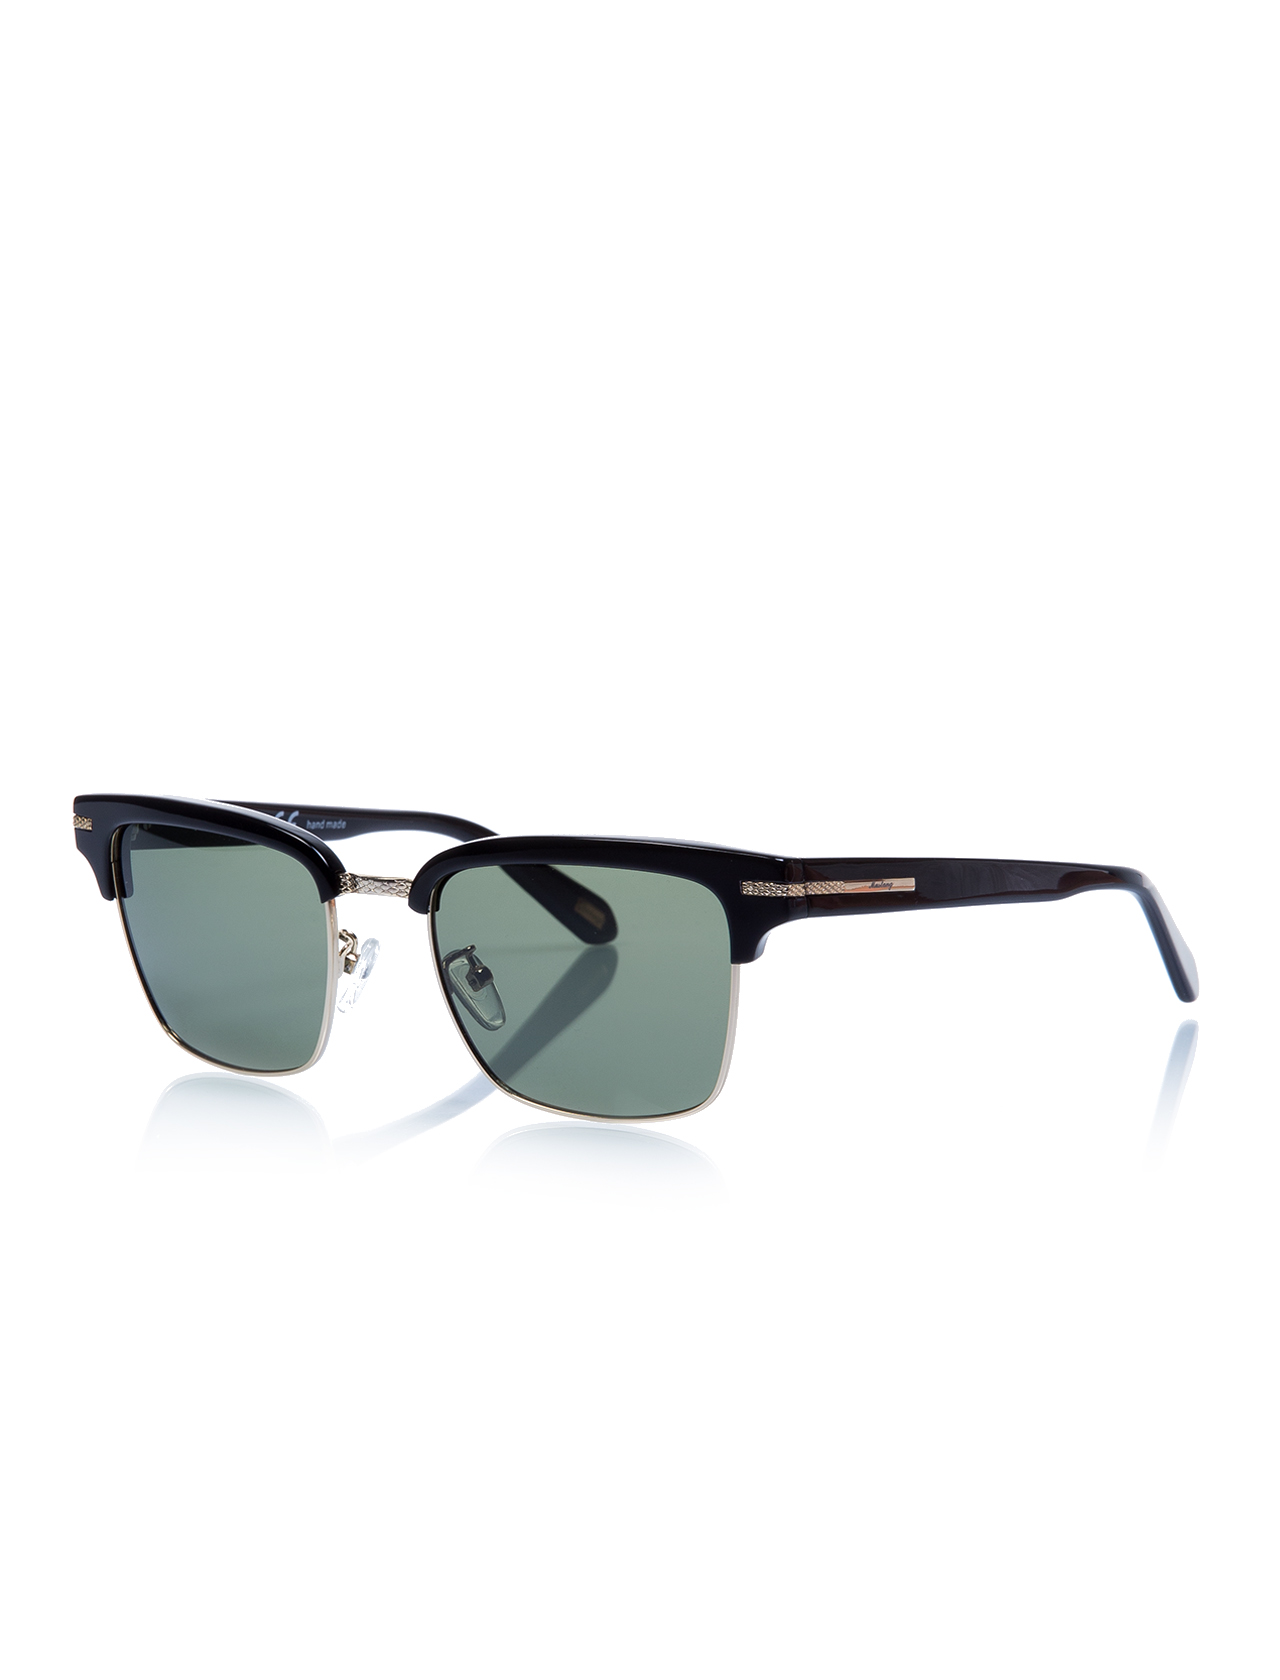 Unisex sunglasses mu 1449 01 clubmaster gold organic square square 53-19-140 mustang